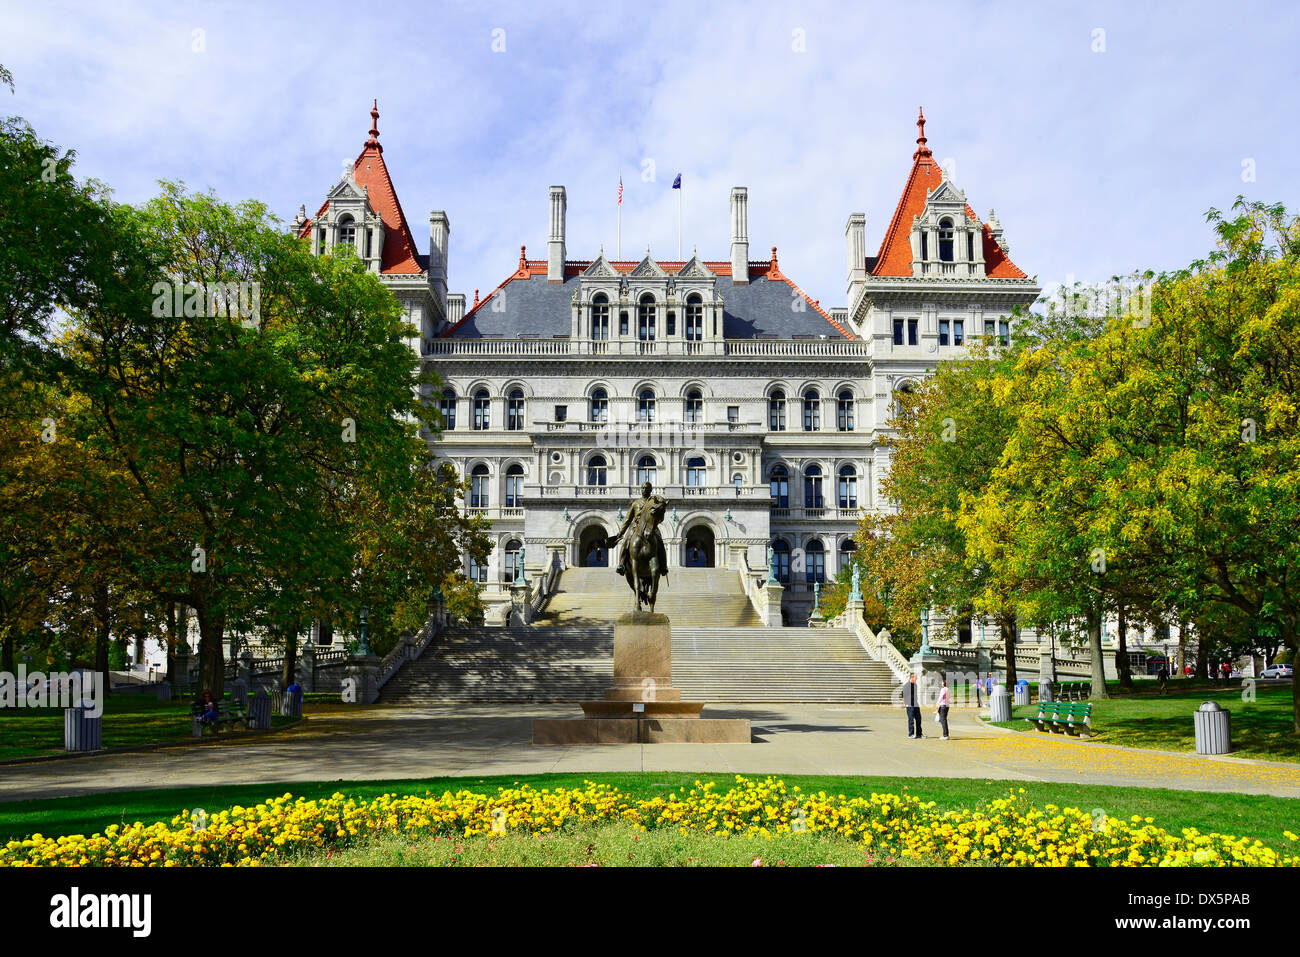 State Capitol Building Statehouse Albany New York NY Capital - Stock Image